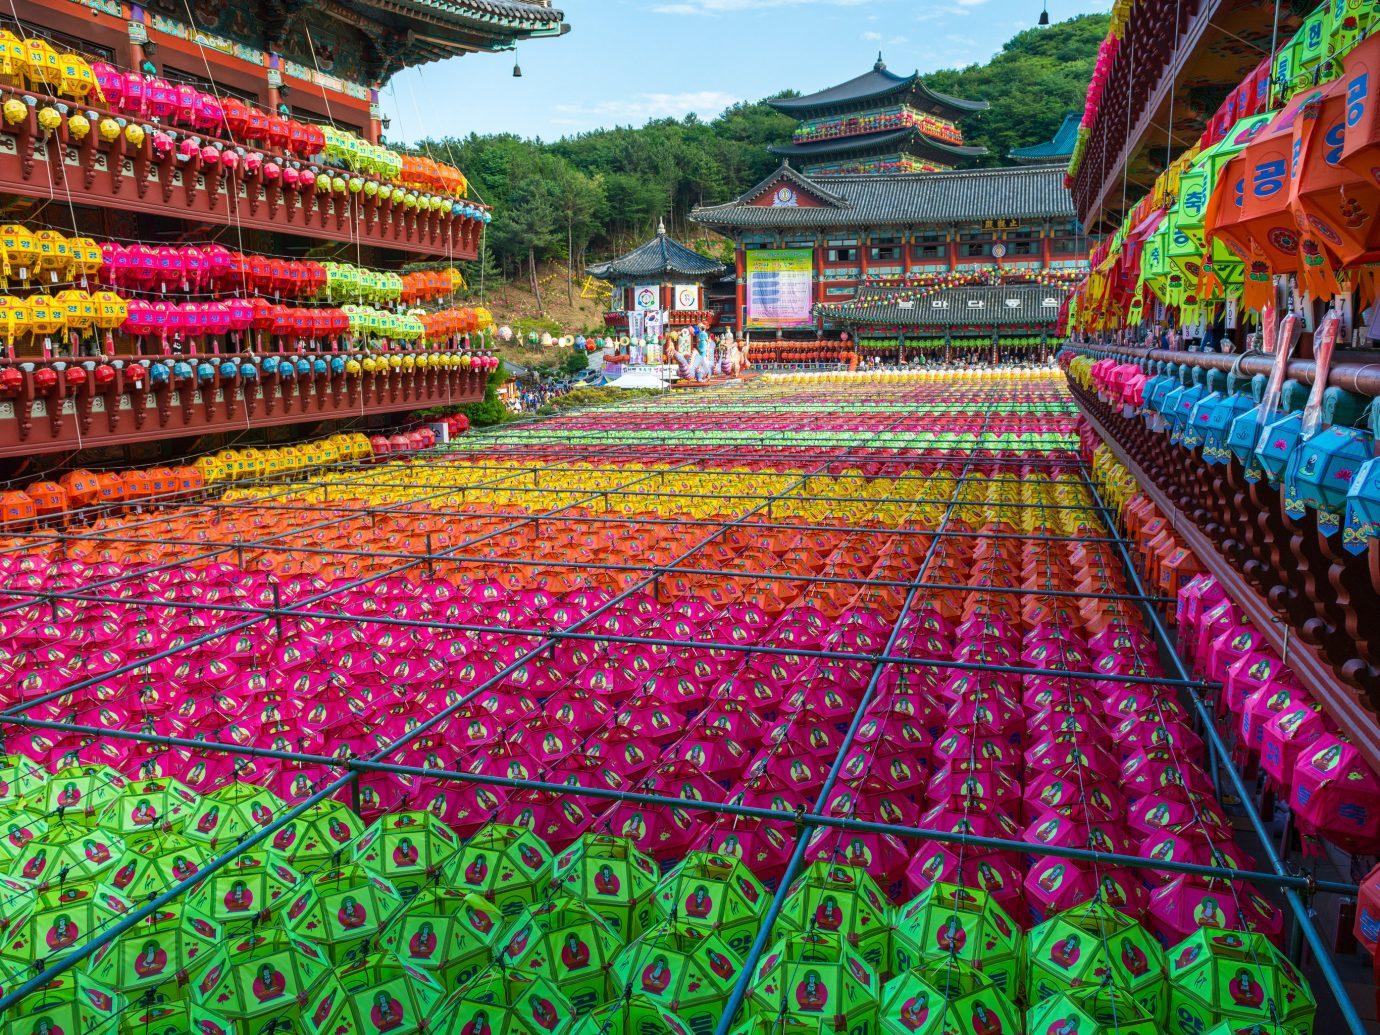 Trip Ideas temple plant leisure festival shrine flower